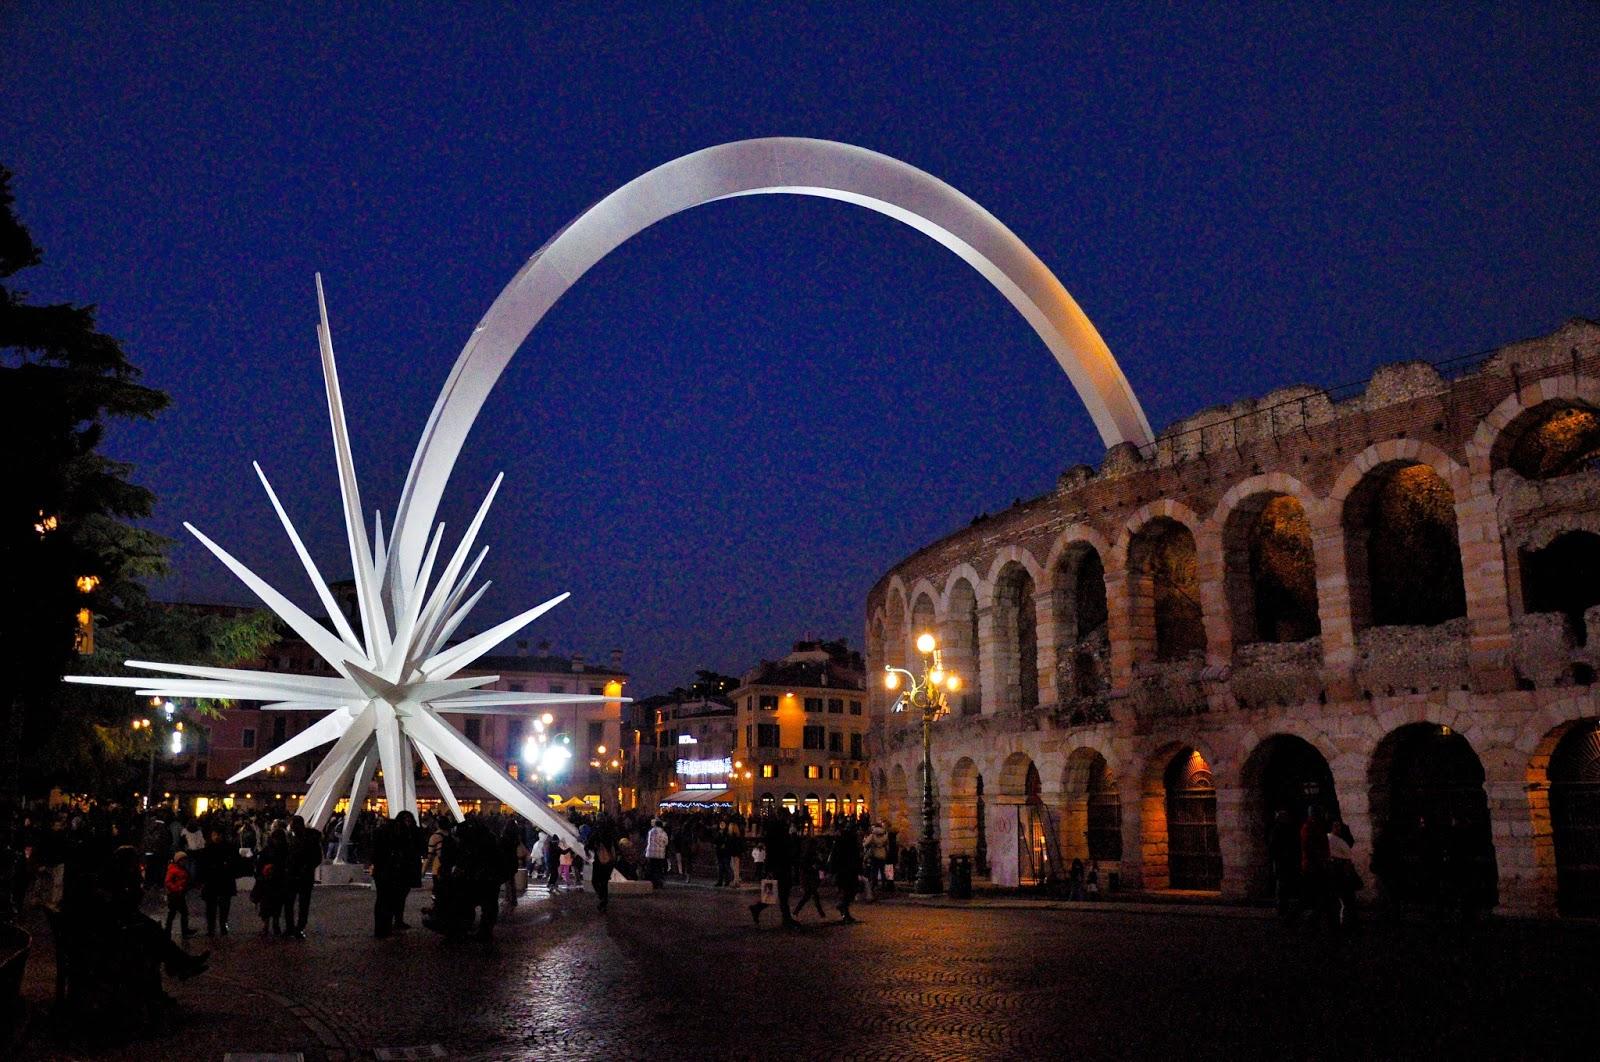 The Christmas Star, Arena di Verona, Verona, Veneto, Italy